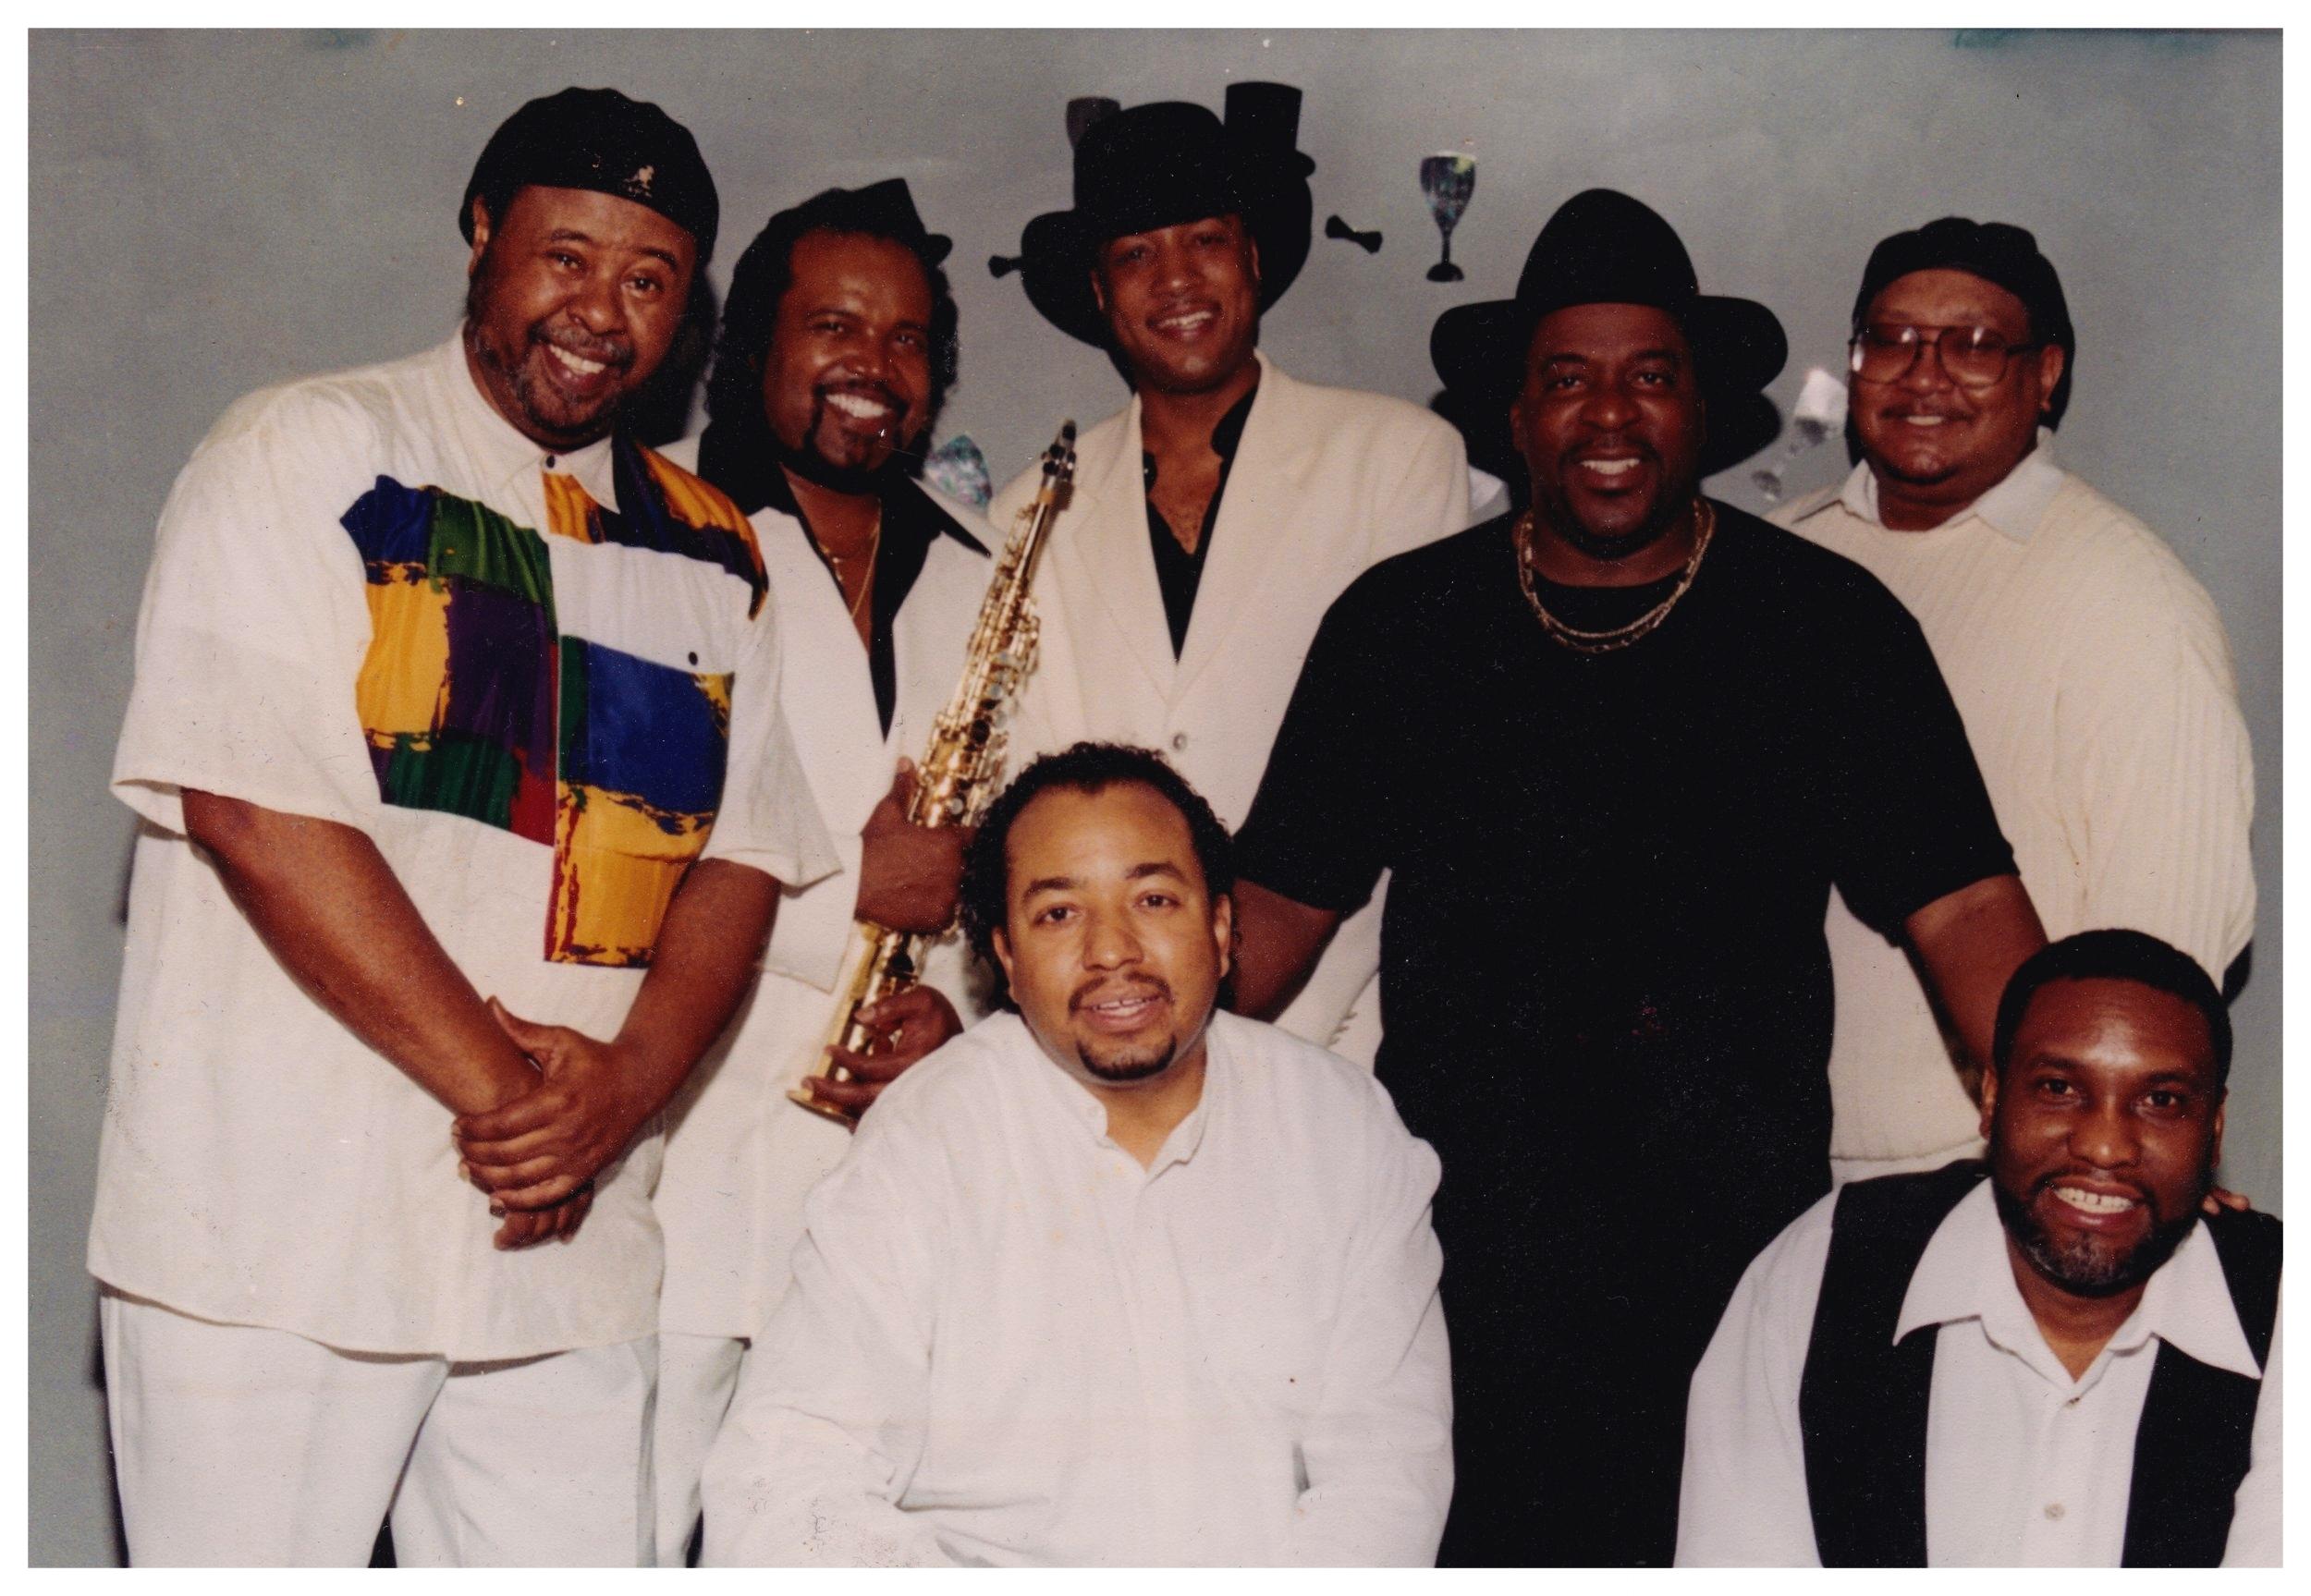 [1998] The Wallstreet Band - R. Smith, M. Clayton, P. Harding, B. Bruner, L. Shaw, B. Giles, M. Gray